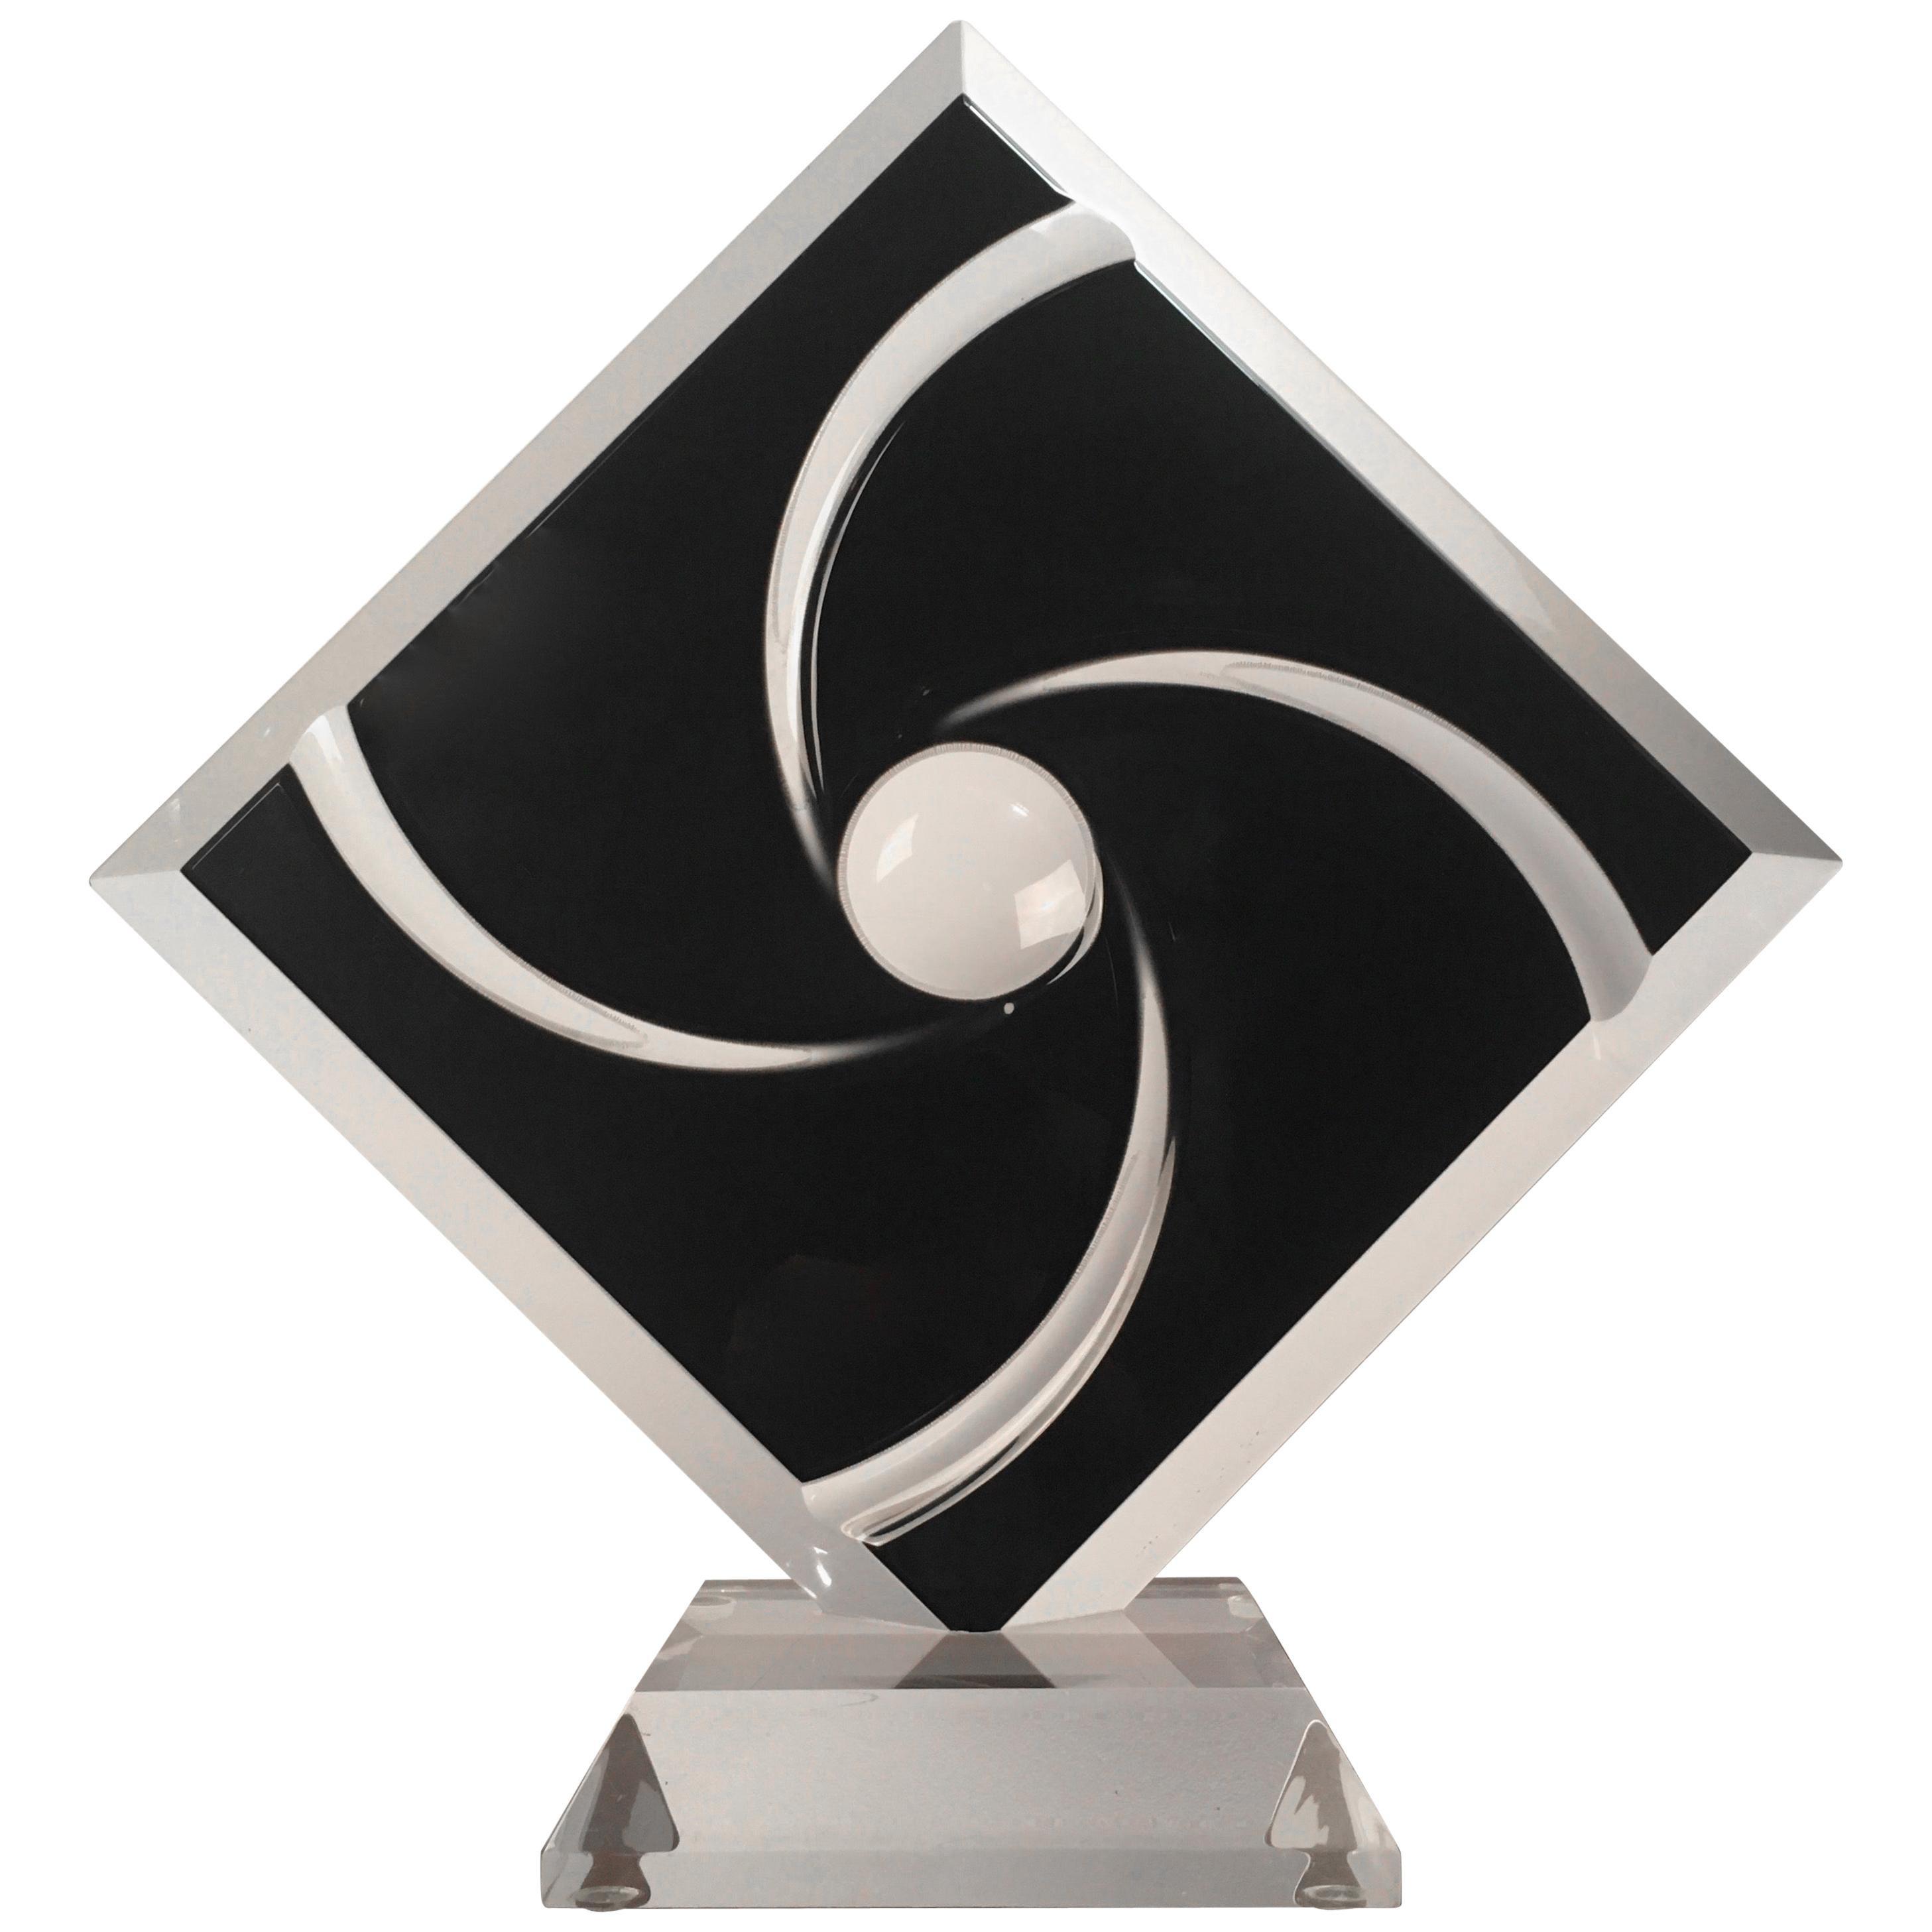 Black Diamond Lucite Sculpture by Shlomi Haziza